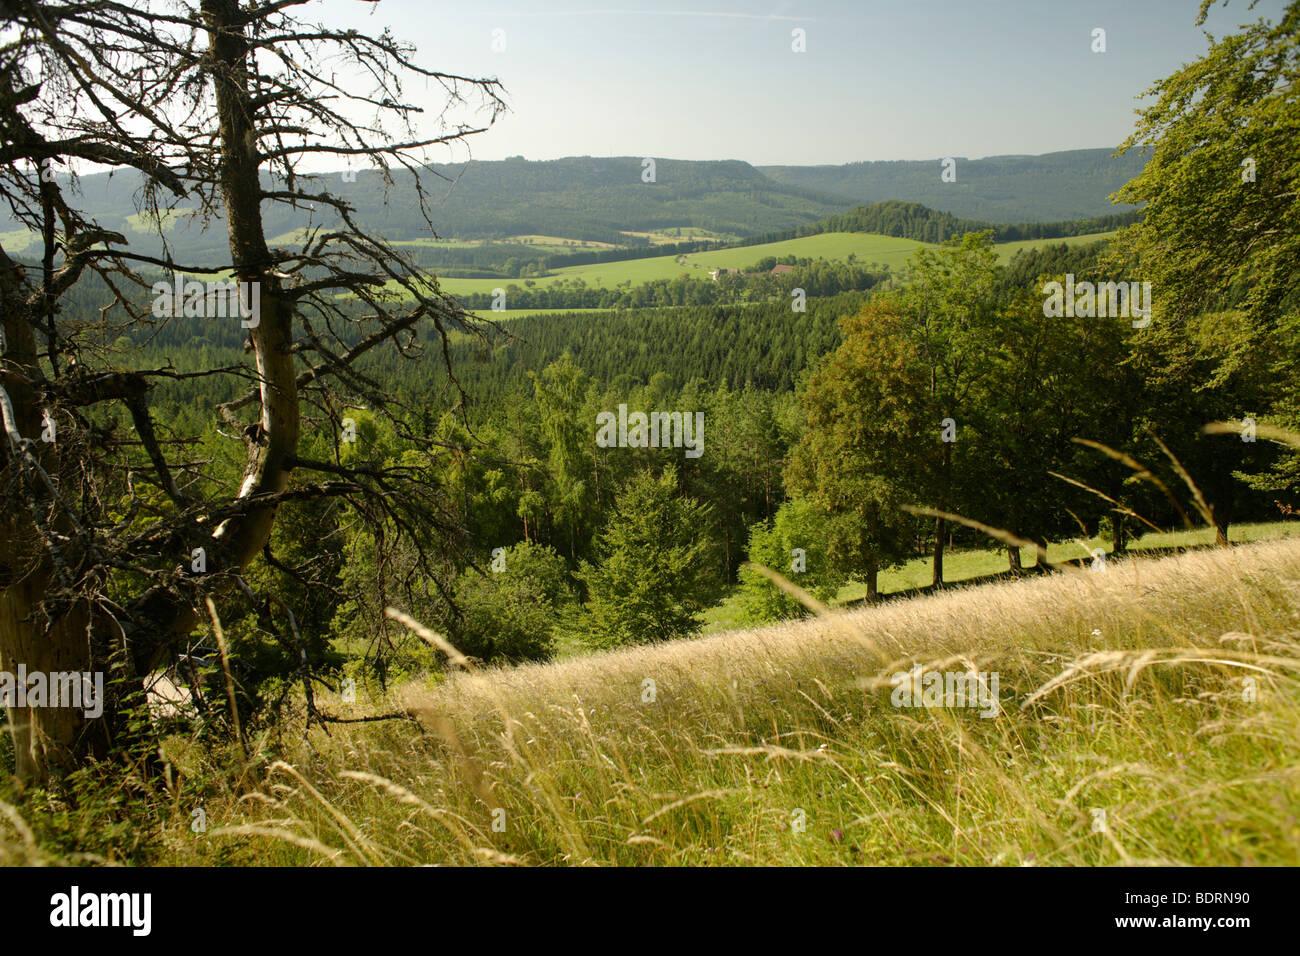 View from Lochenstein in the Danube Valley,schwaebische Alb, Donaubergland, Baden-Wuerttemberg, Germany, Europe - Stock Image